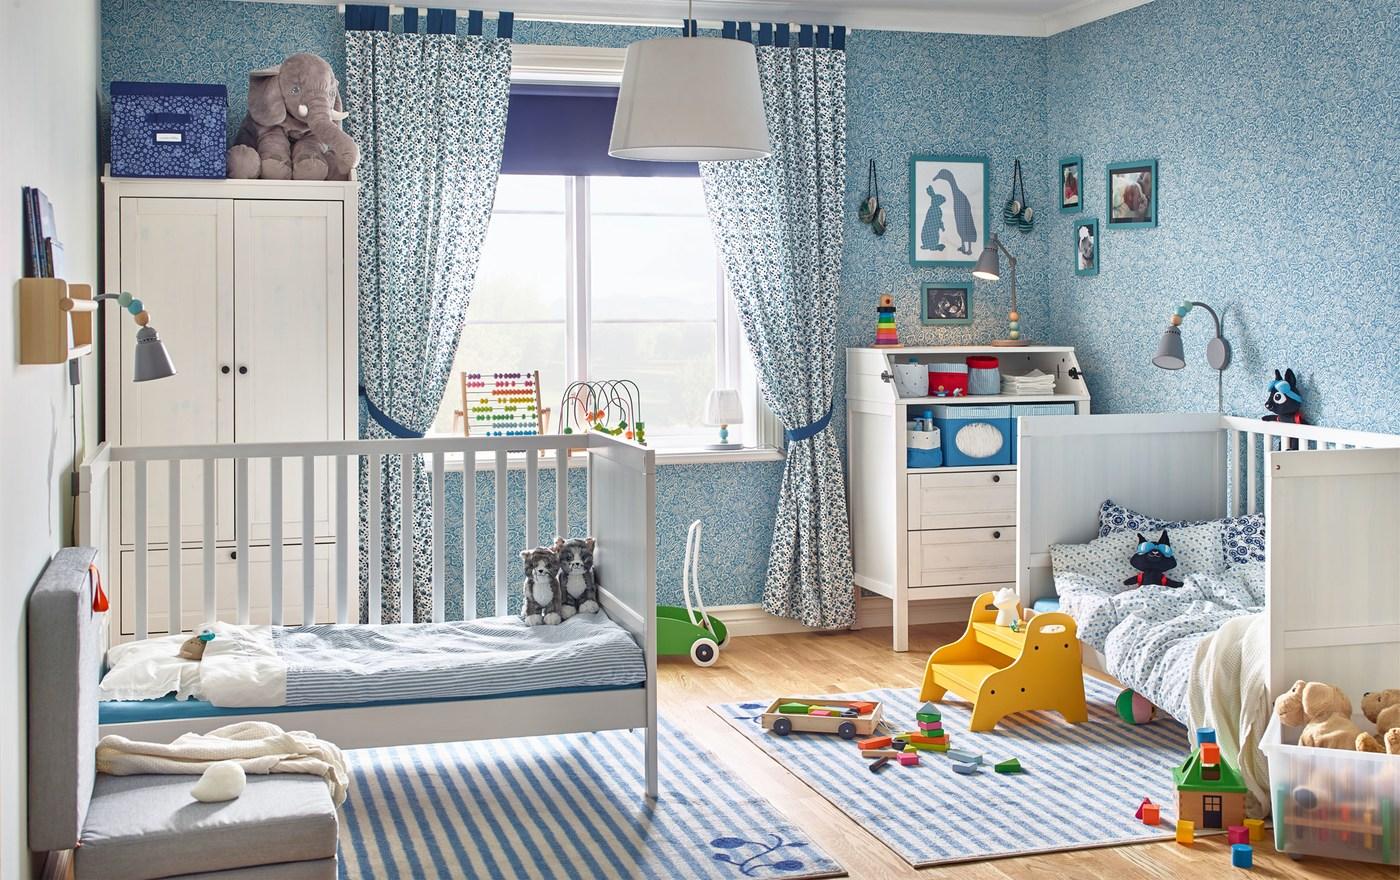 Ikea & Childrens Furniture - Kids Toddler \u0026 Baby - IKEA